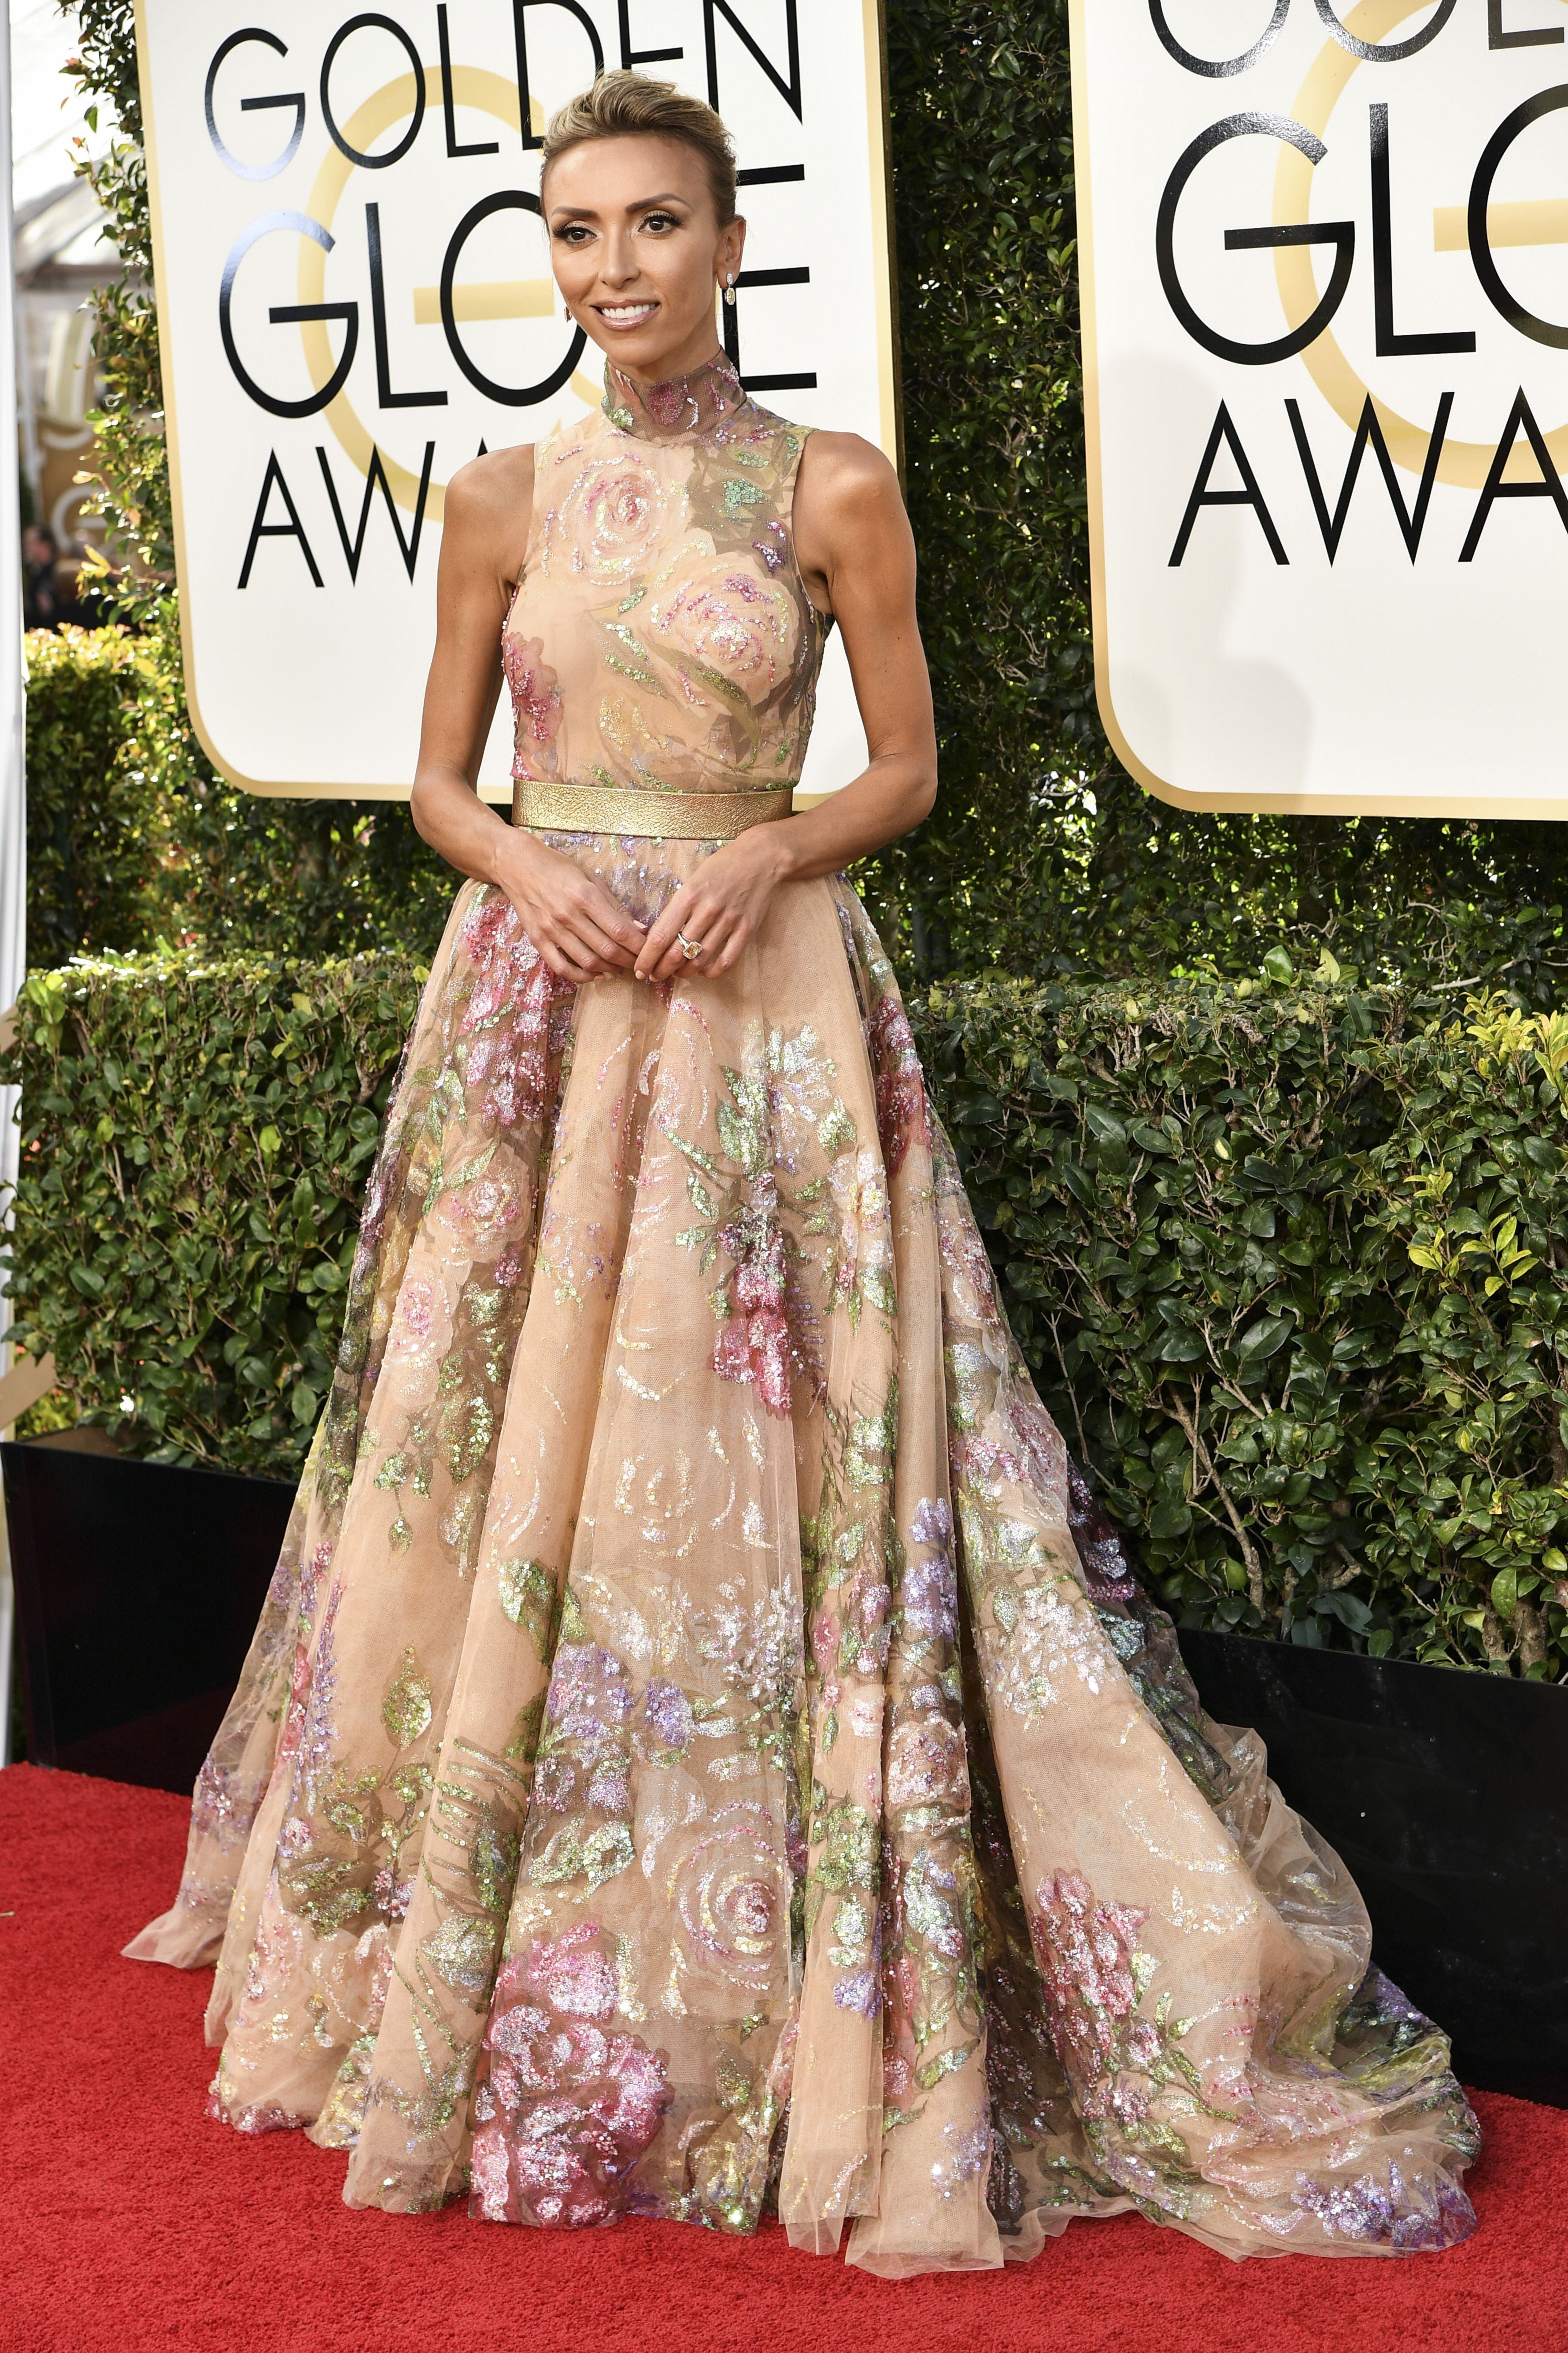 Giuliana Rancic, Golden Globes. Mandatory Credit: Photo by Rob Latour/REX/Shutterstock